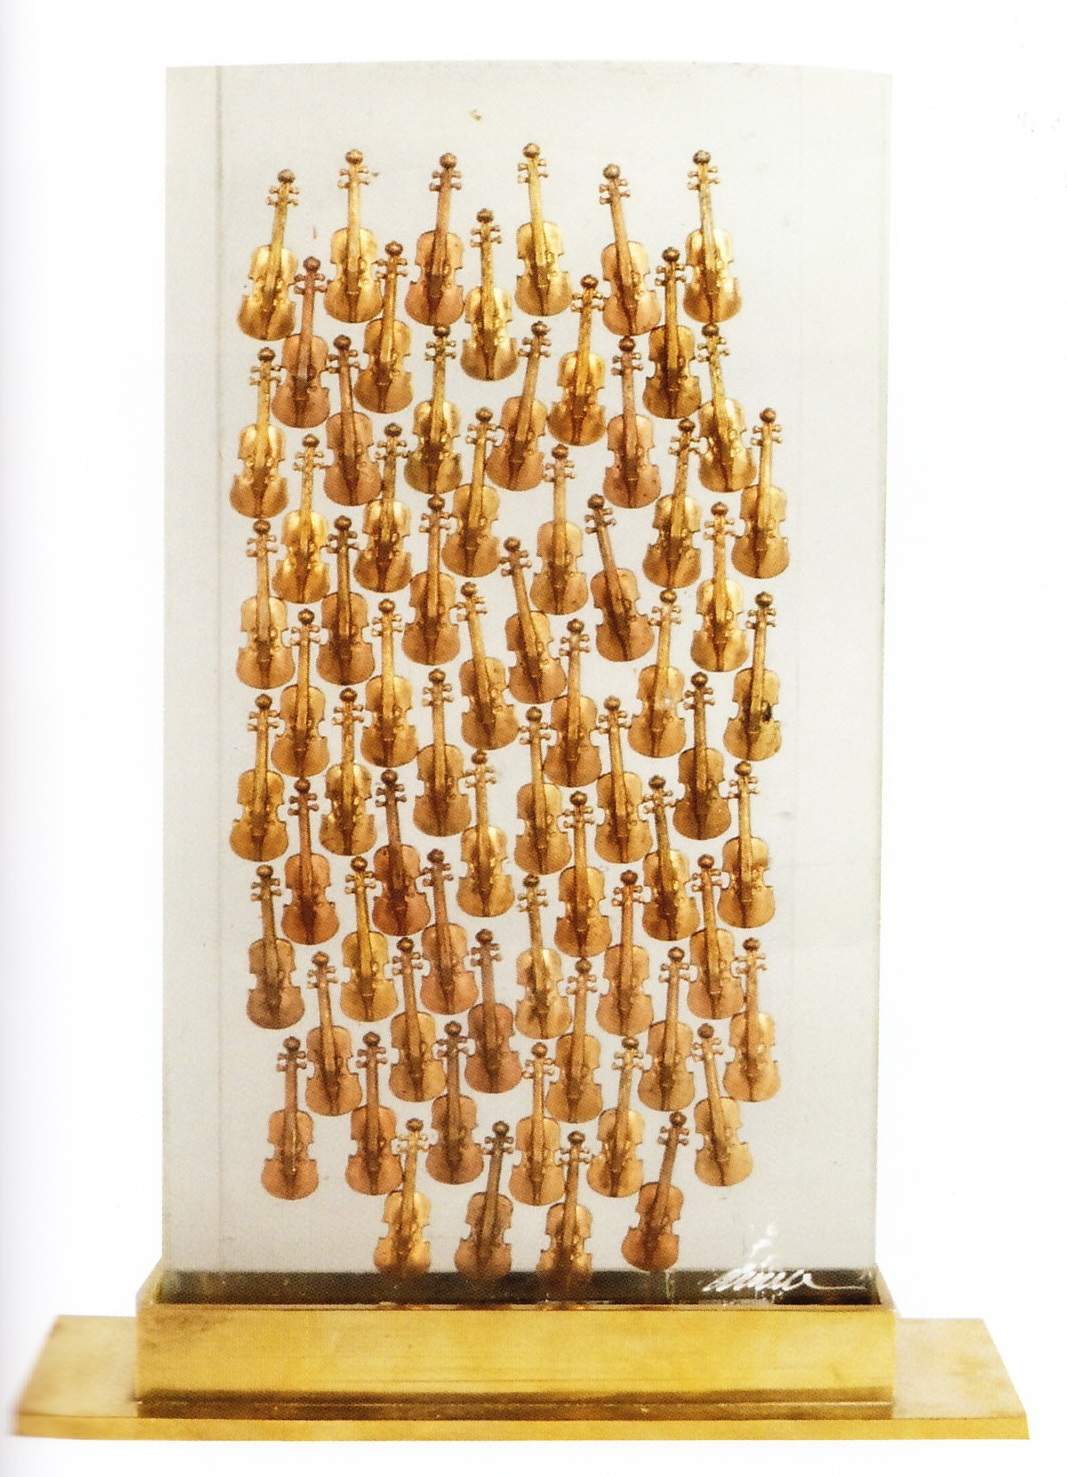 Vente Arman, Vasarely, Christo, Combas, Shepard Fairey  Banksy… Multiples et Originaux  chez Sadde - Dijon : 176 lots